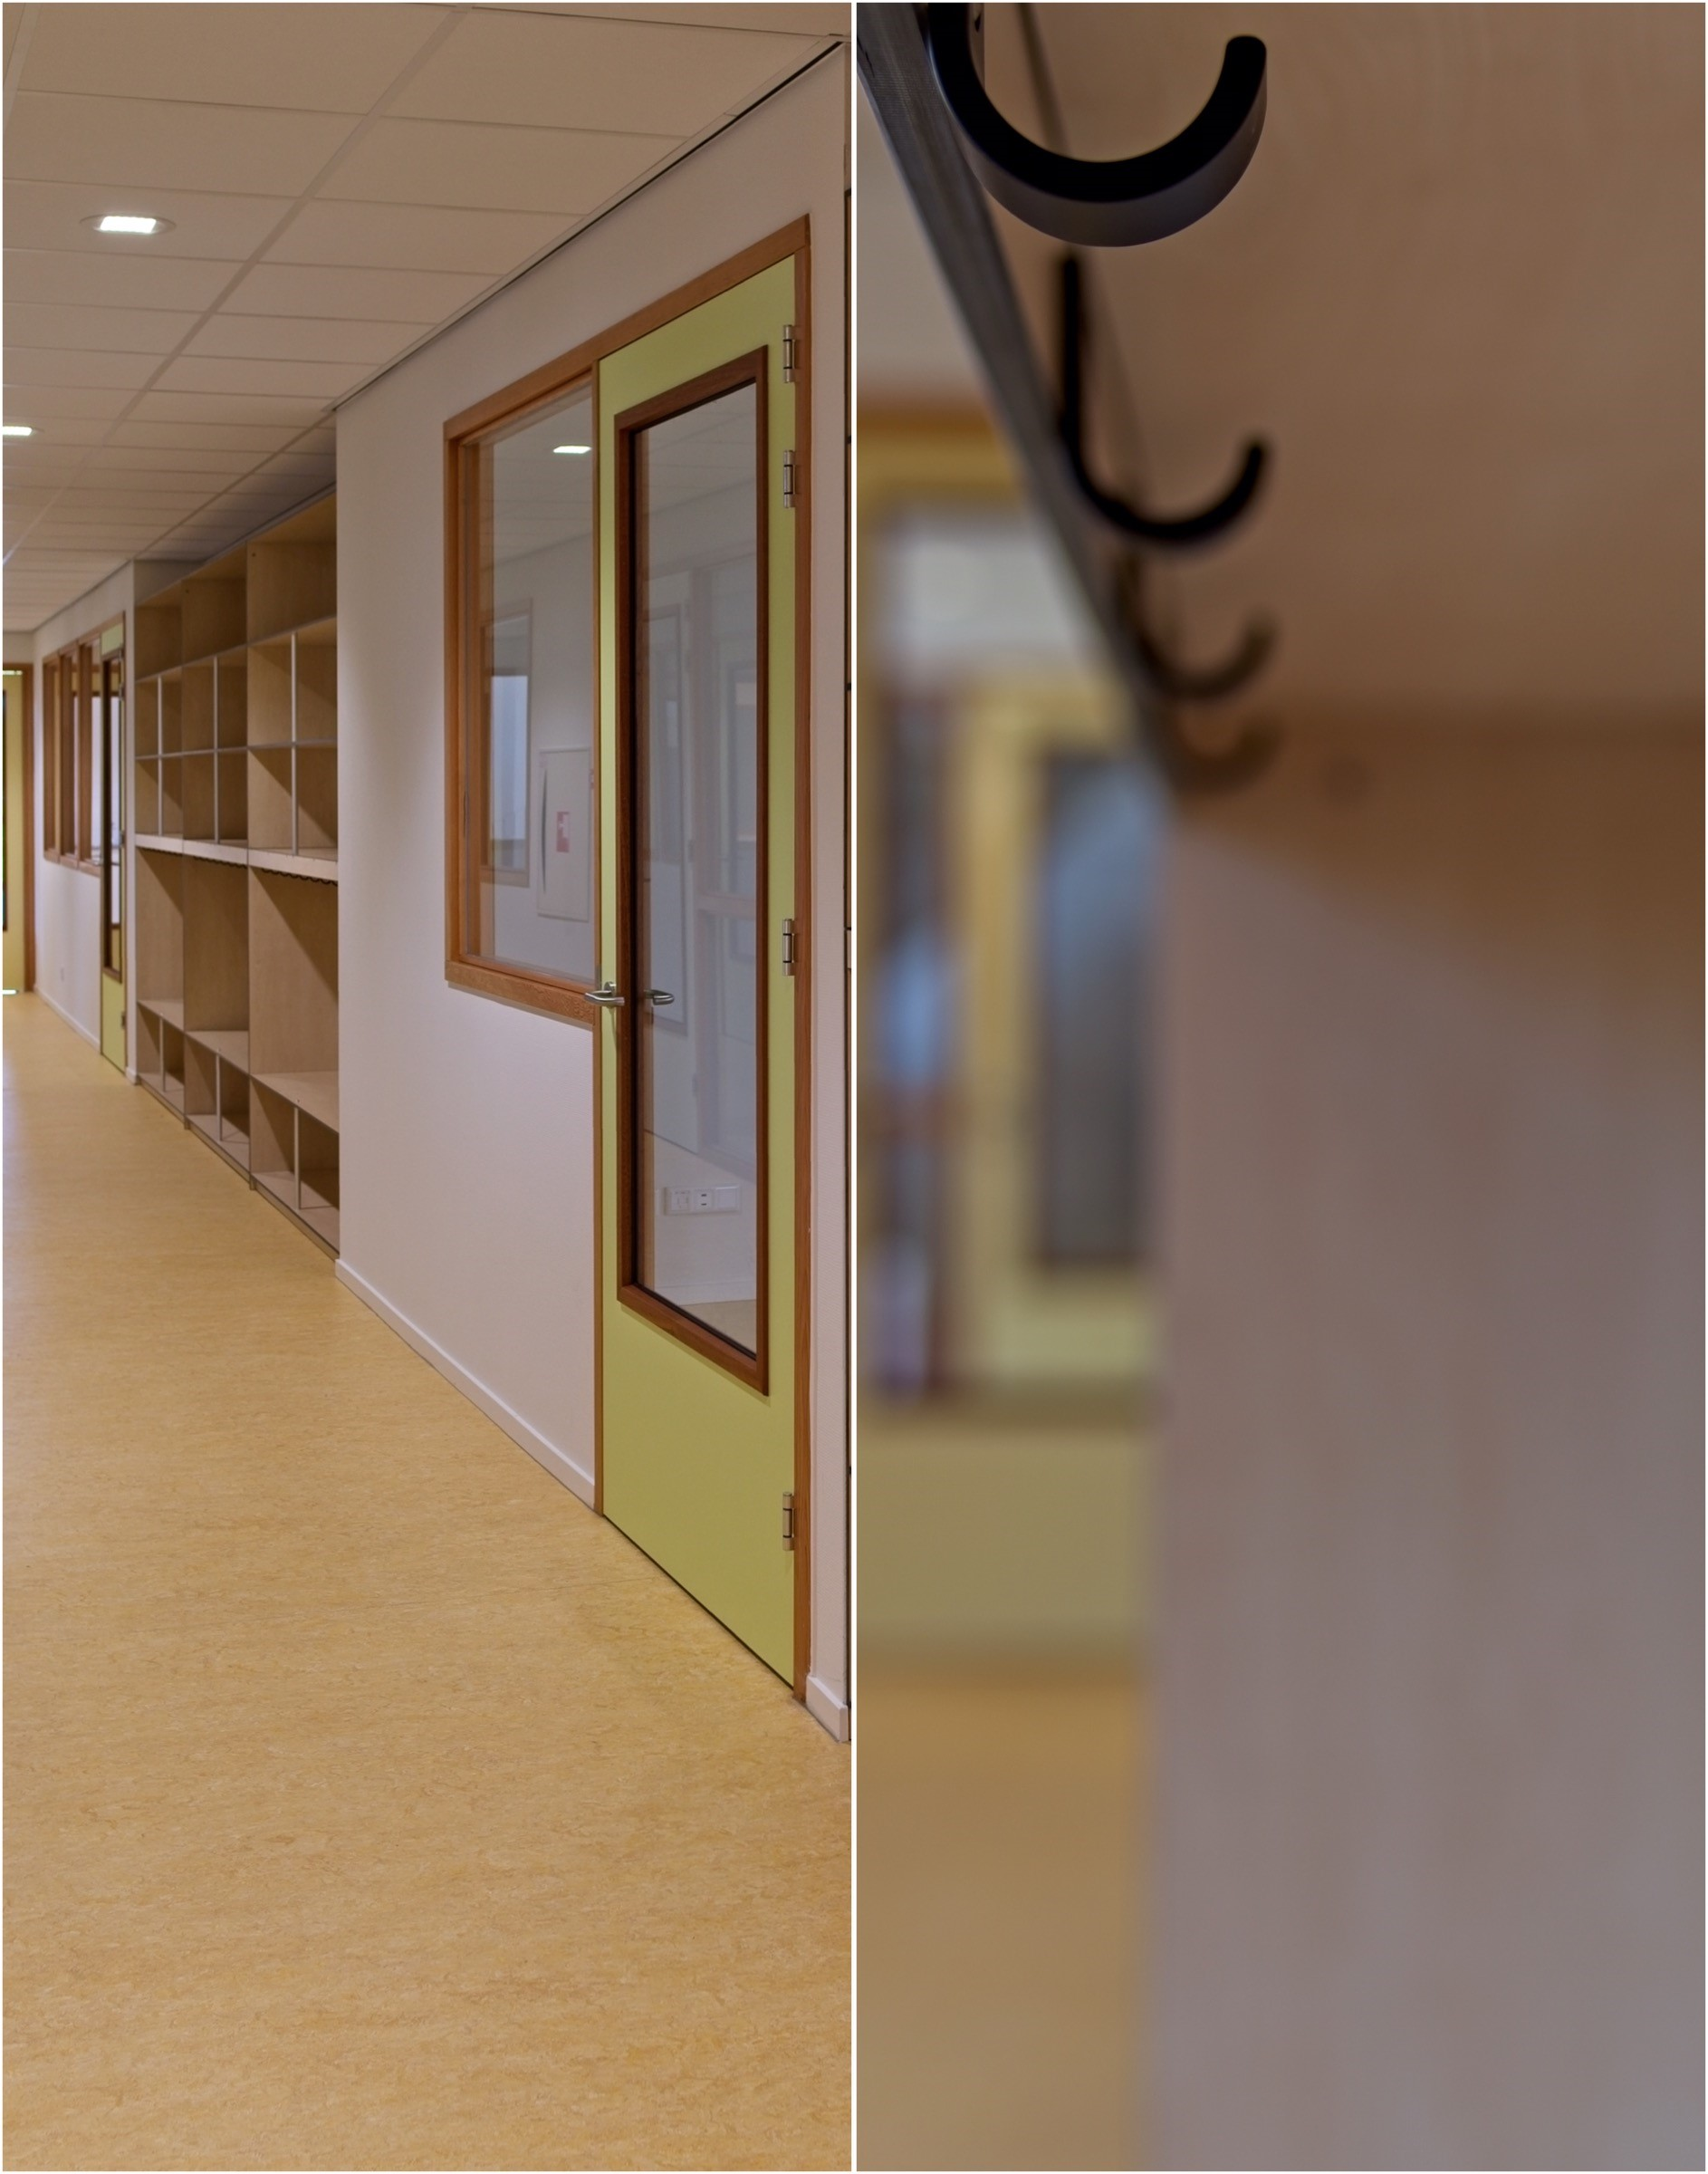 Hermeta Interieurbouw Sterren school Hilversum zwarte haak jashaal garderobe garderobemeubel circulair